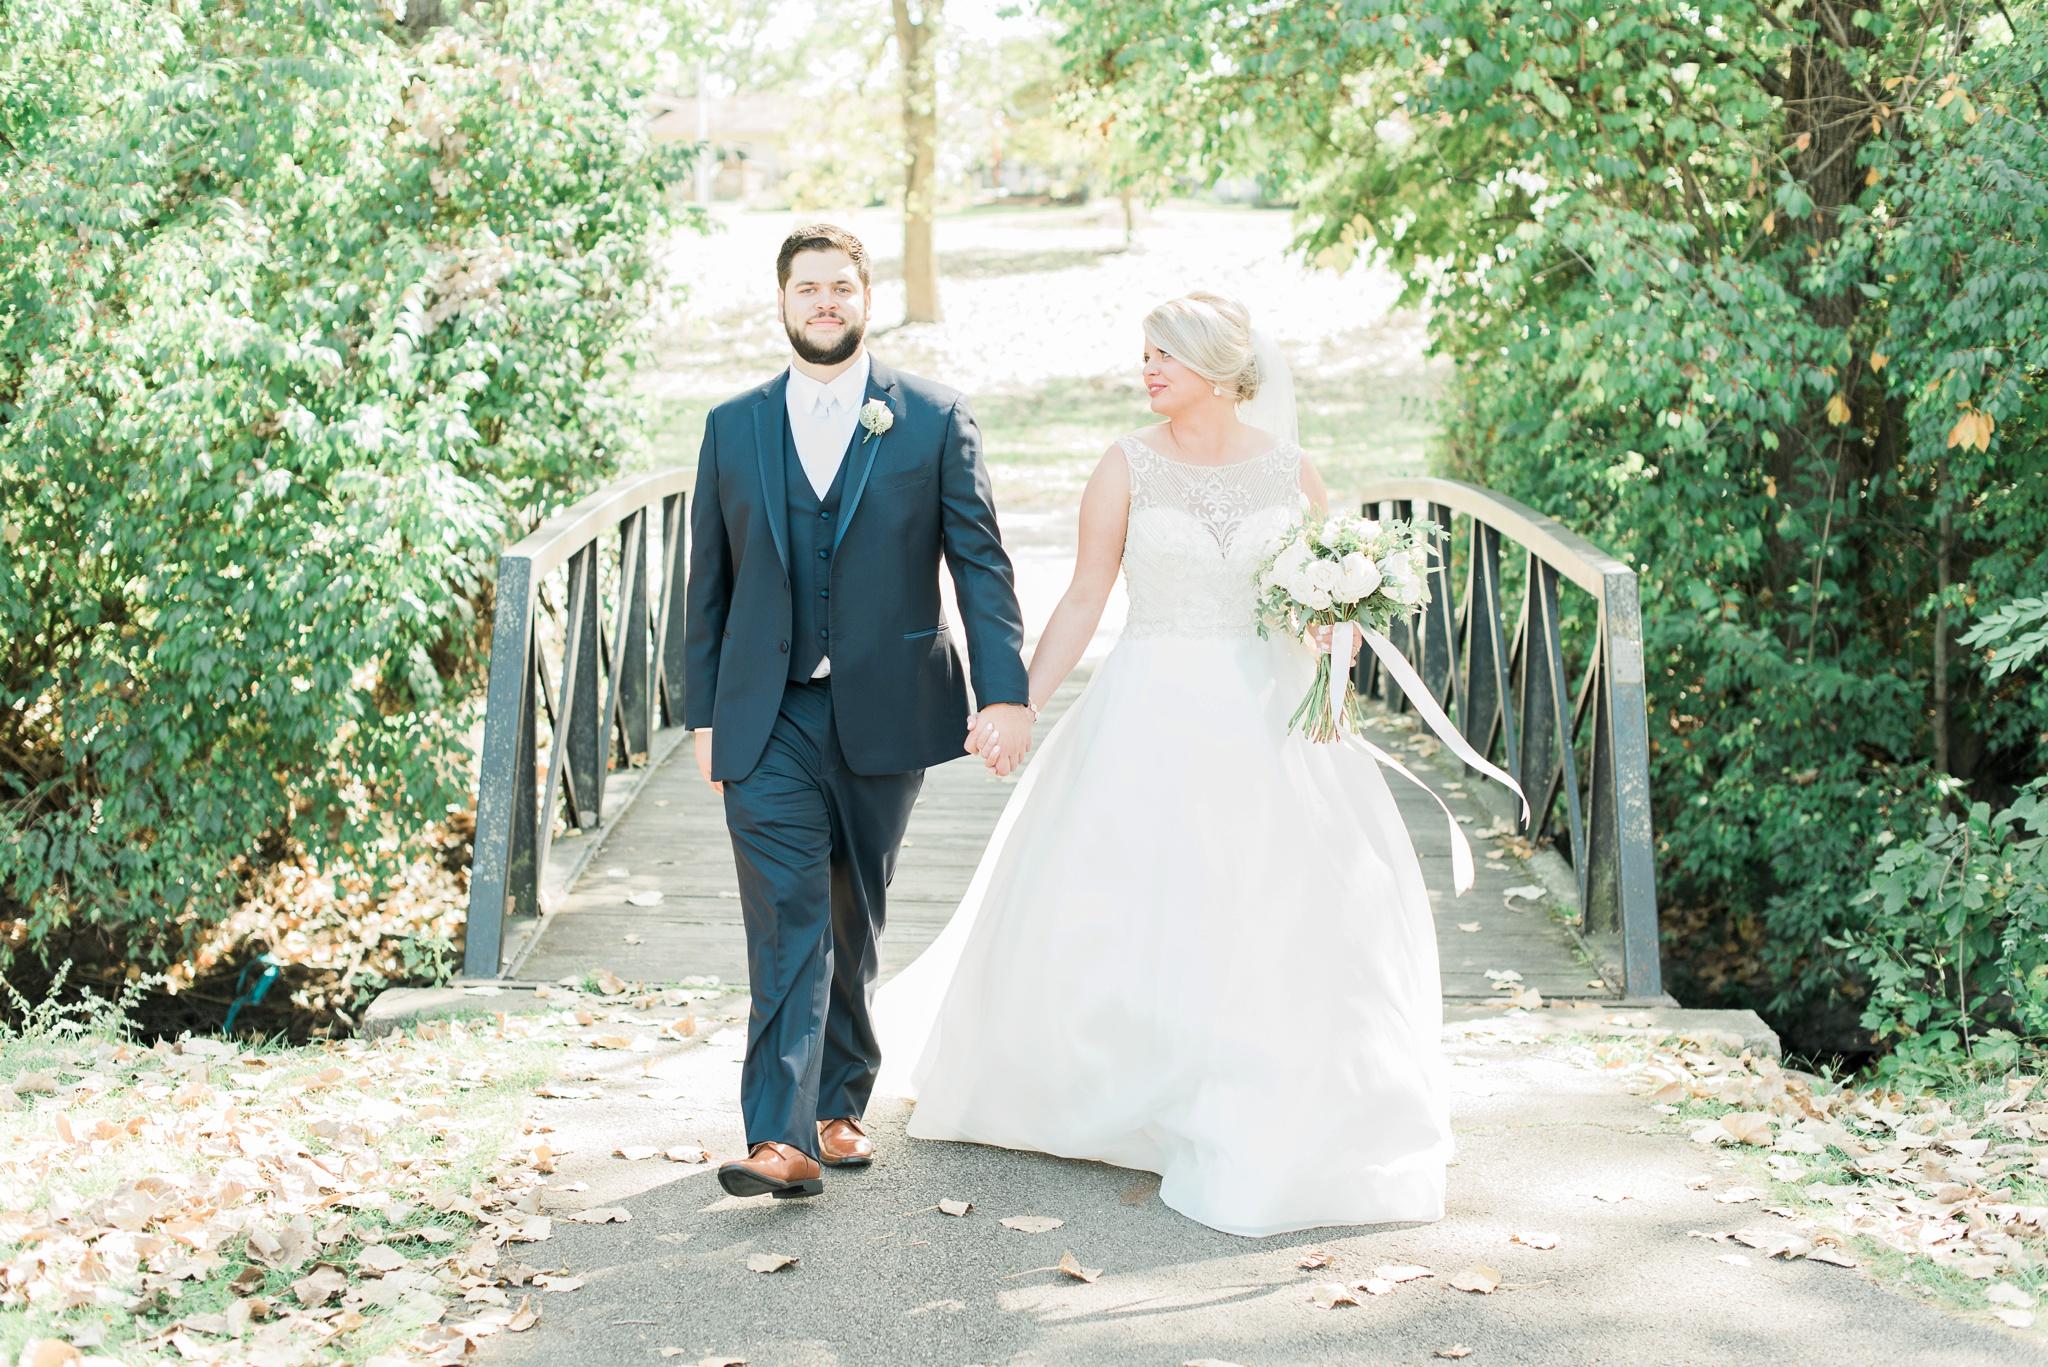 aladdin-shrine-center-wedding-grove-city-ohio-amber-jared_0086.jpg